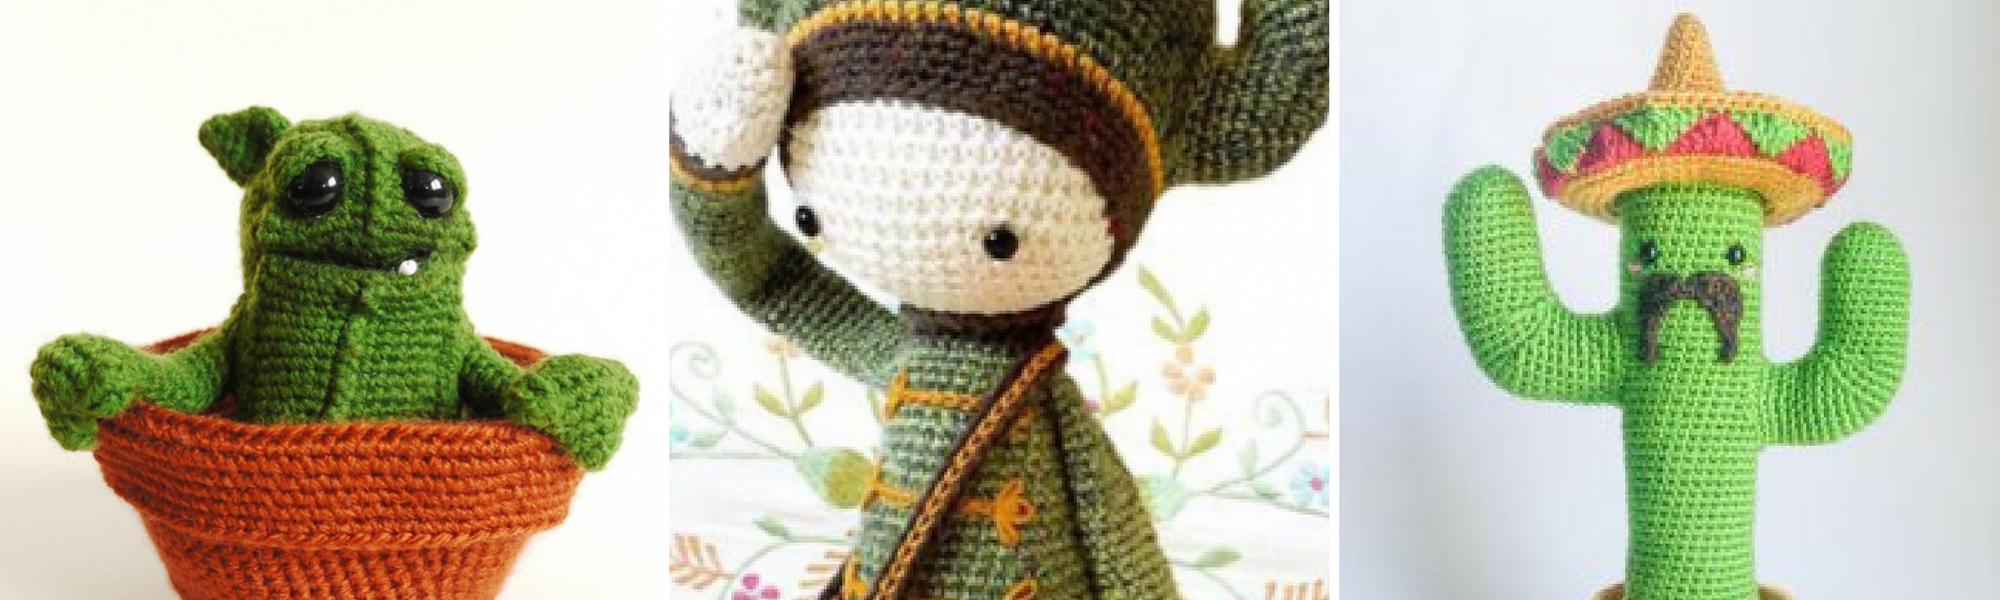 Amigurumi cactus crochet patterns